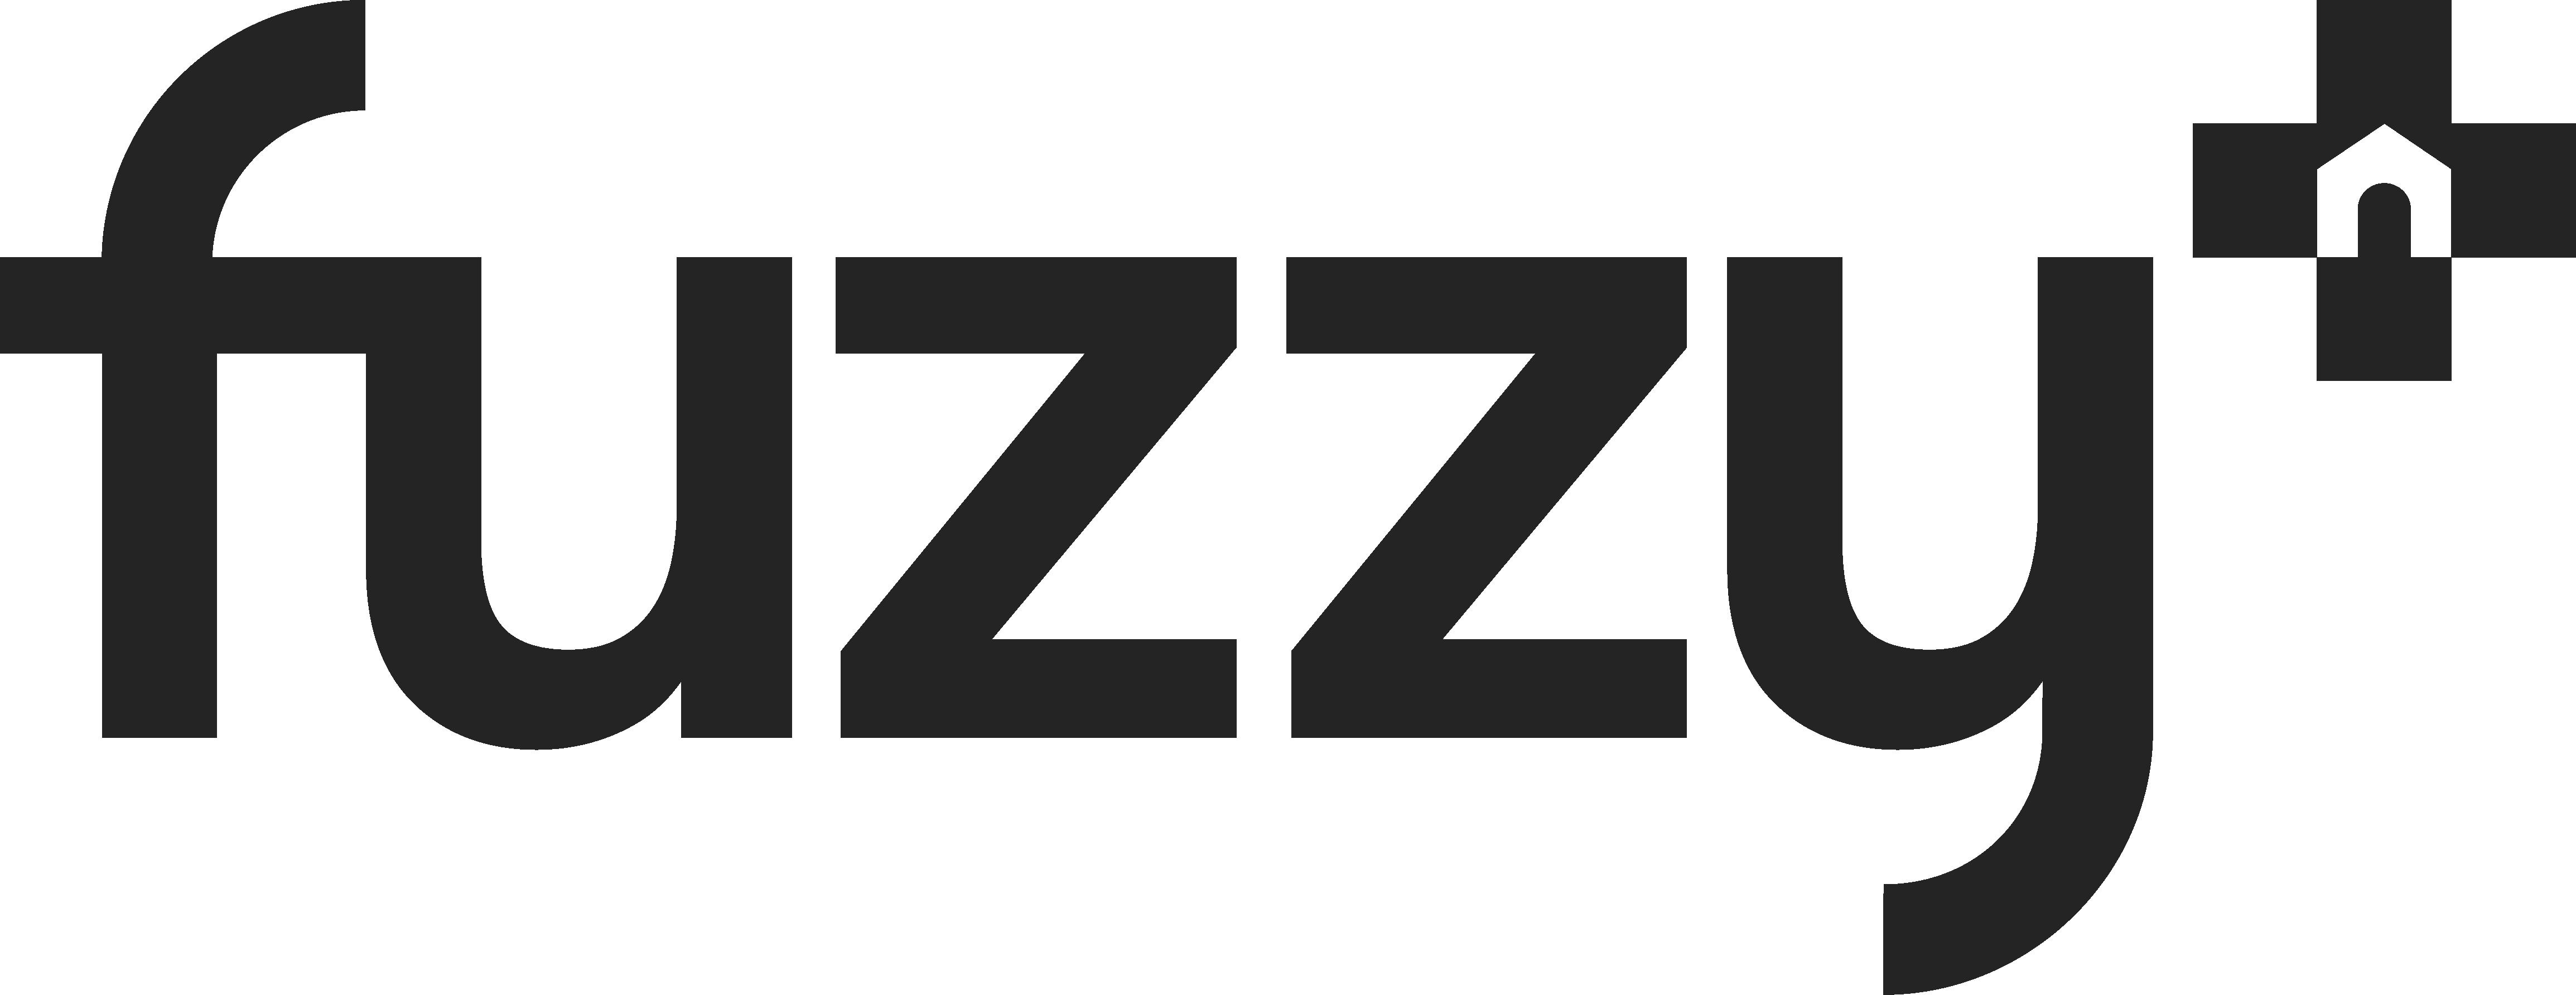 Fuzzy Pet Health, Inc. logo